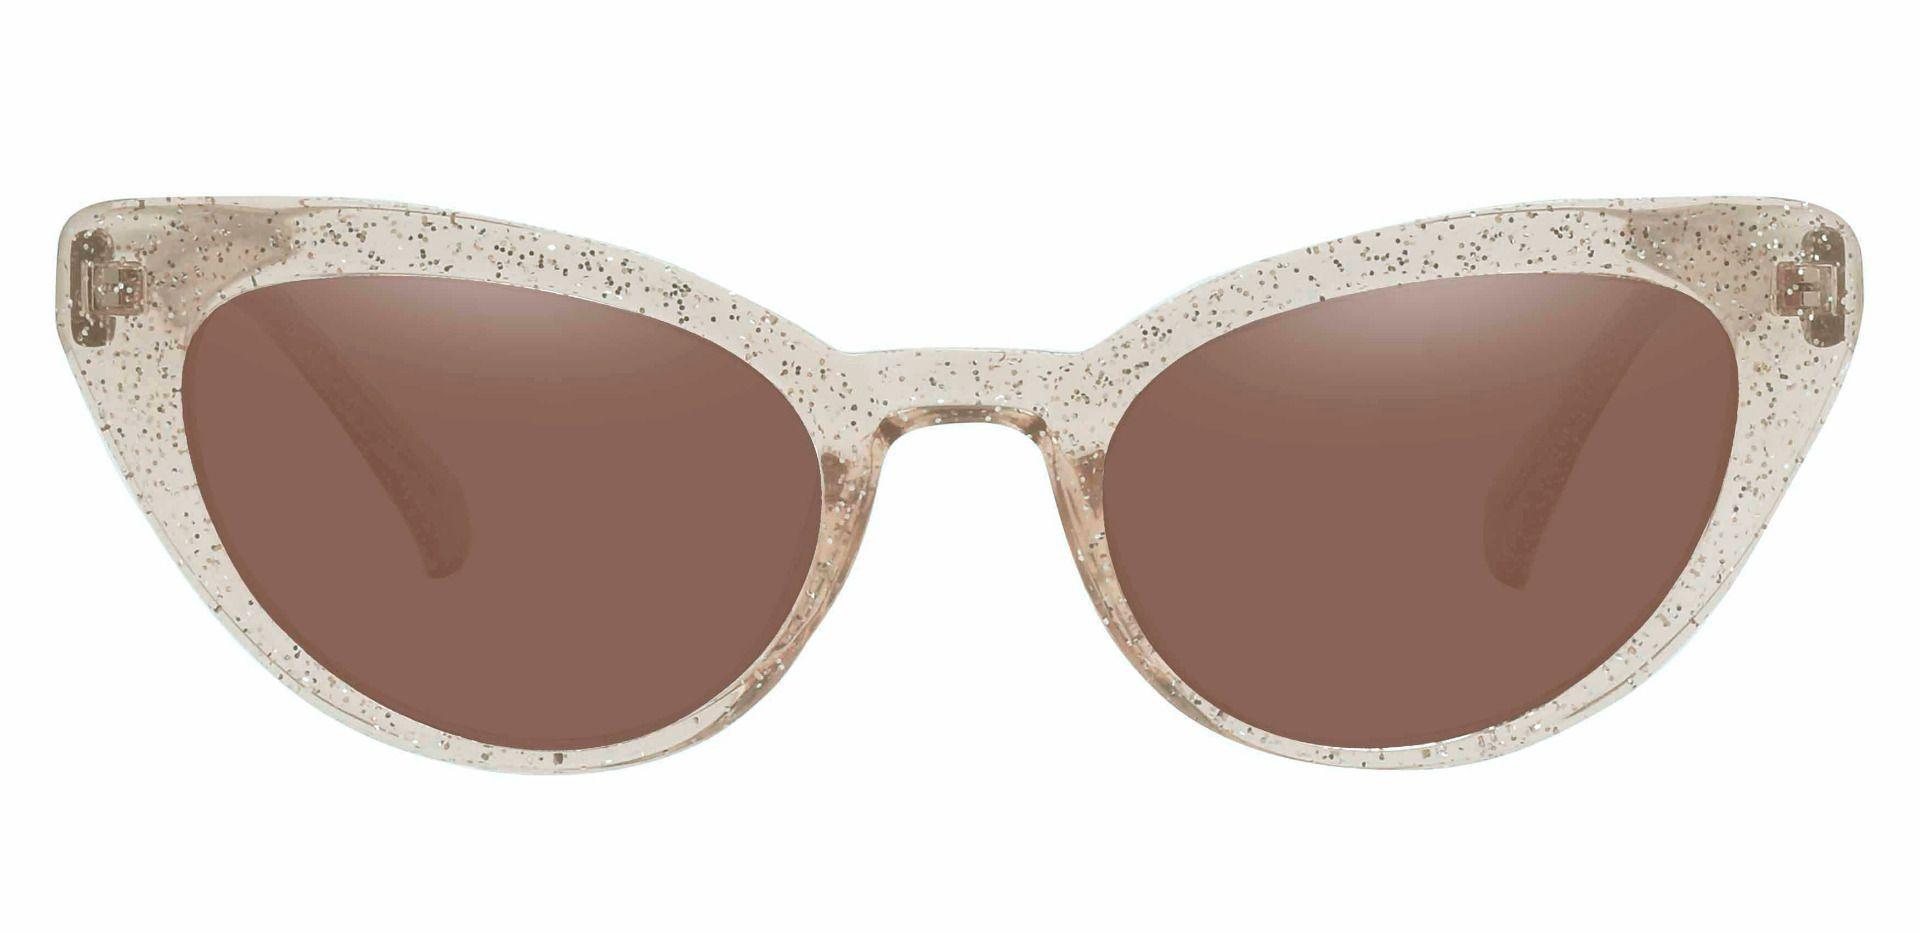 June Cat Eye Prescription Sunglasses - Brown Frame With Brown Lenses